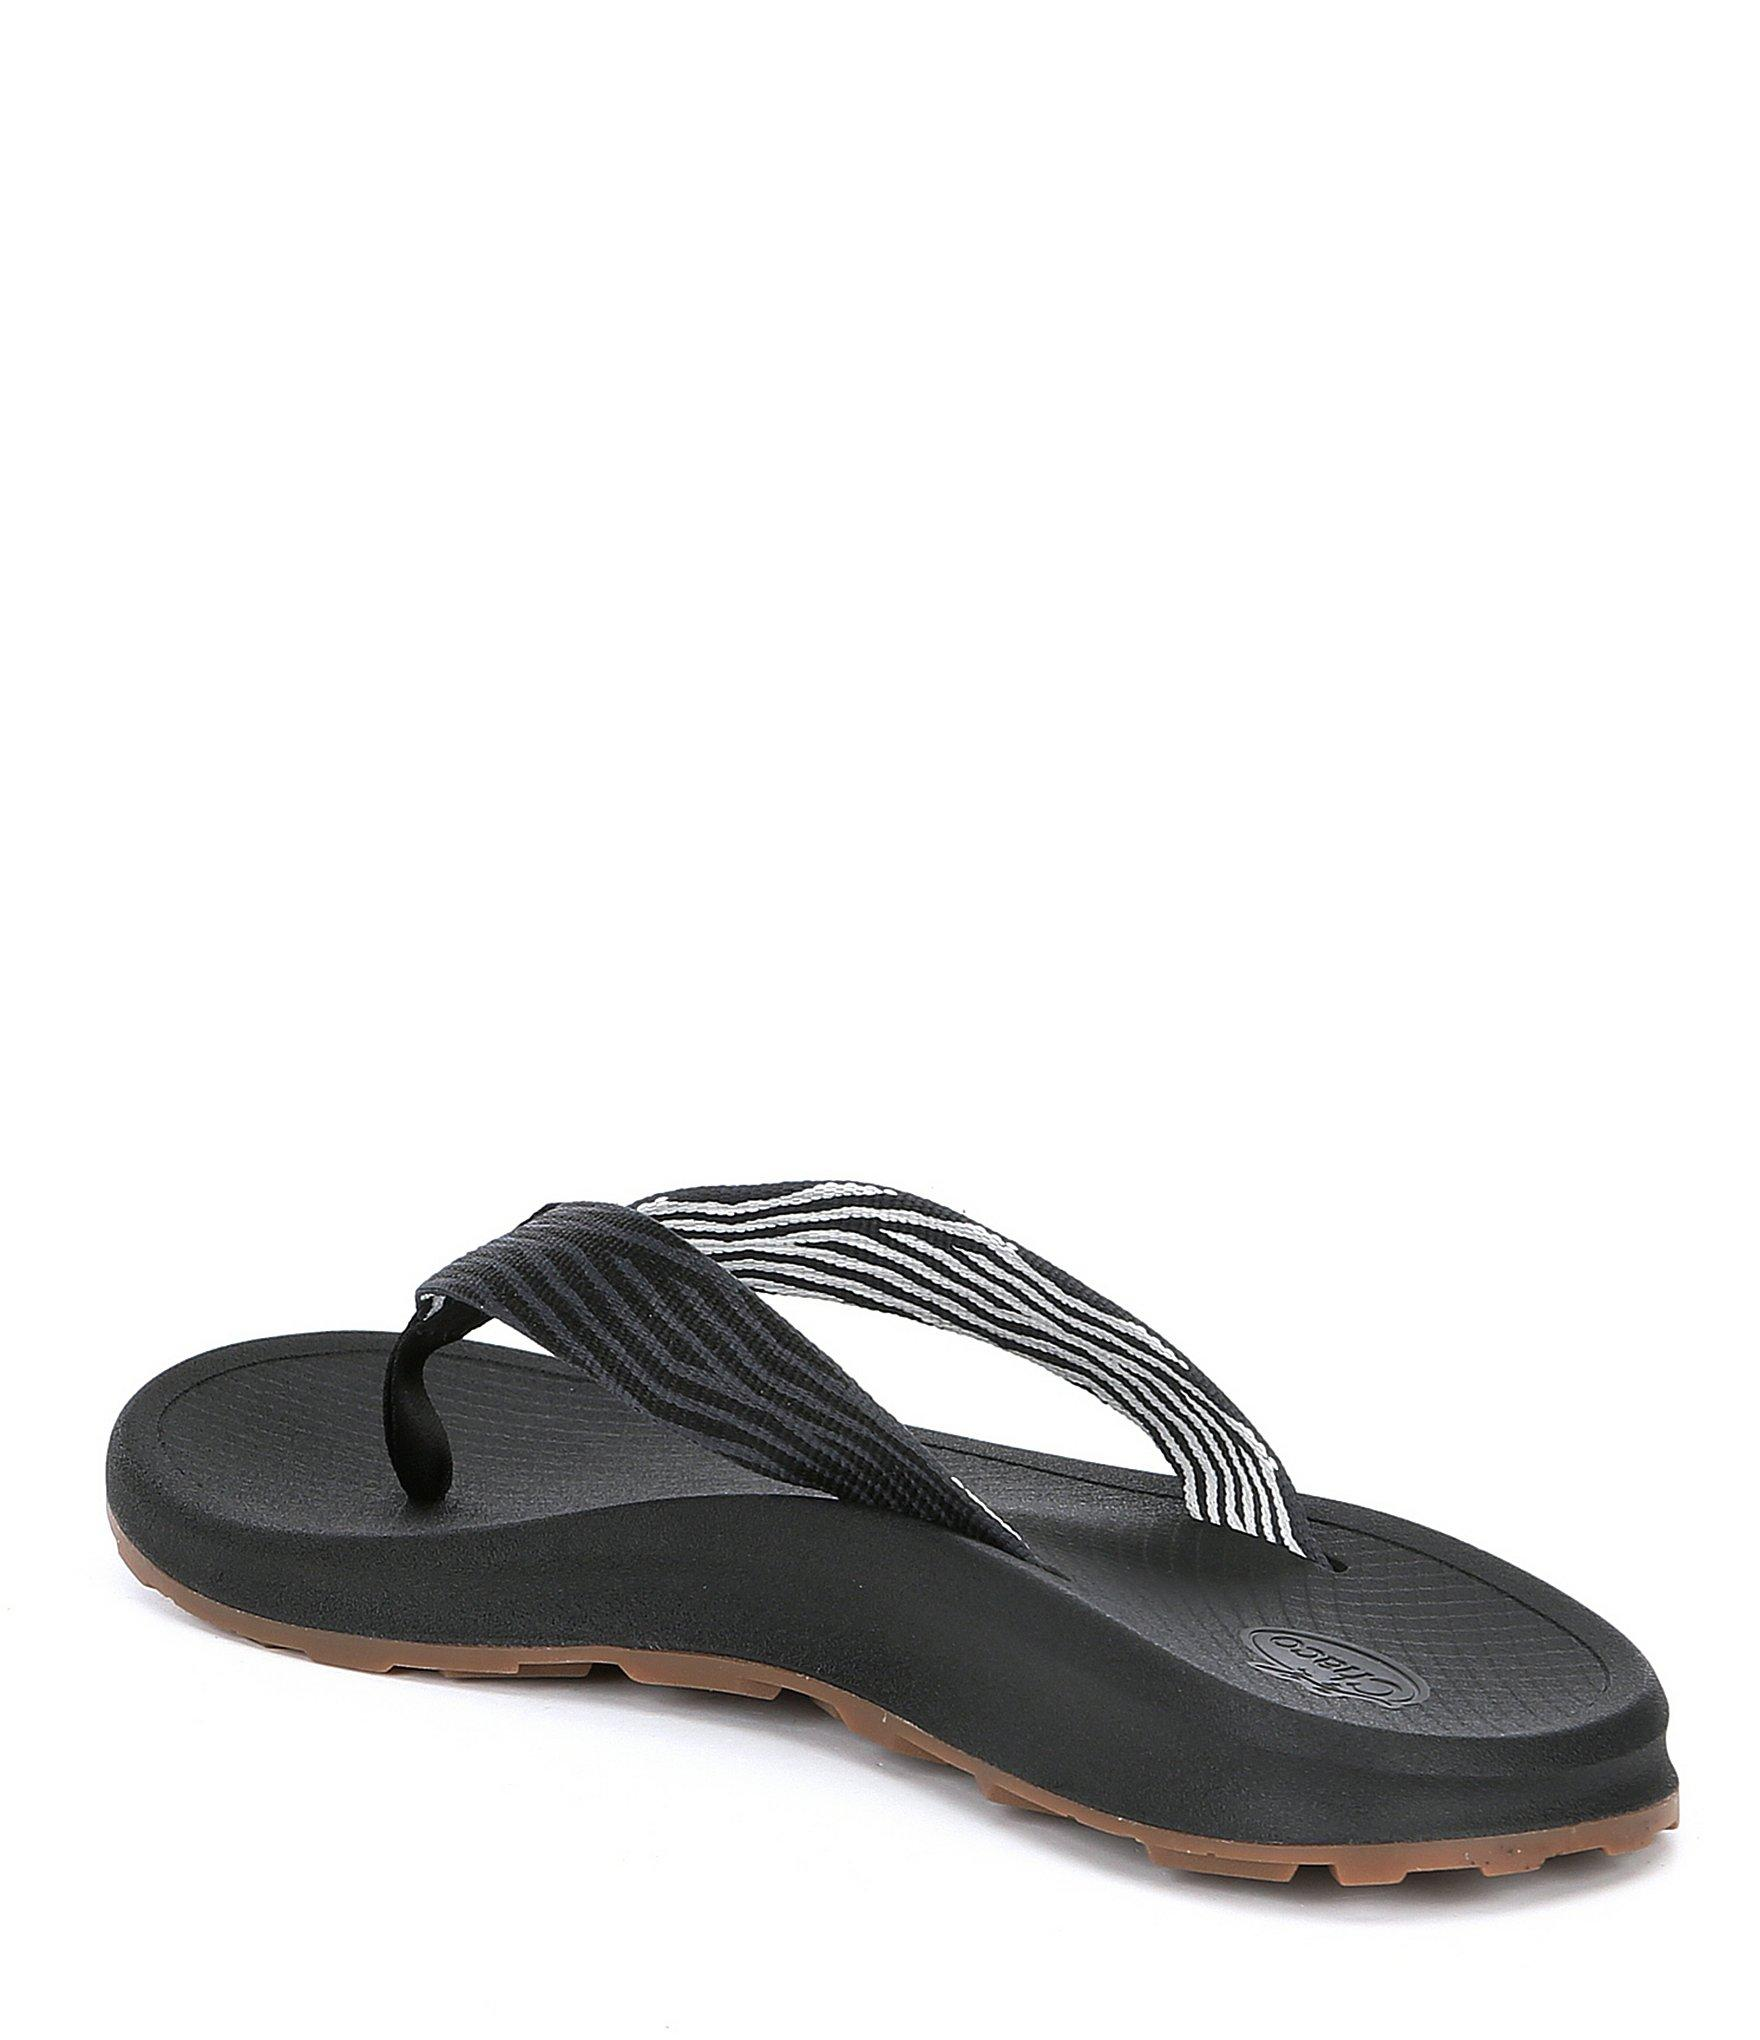 45d685fcac75 Chaco - Black Men s Playa Pro Web Flip Flop for Men - Lyst. View fullscreen